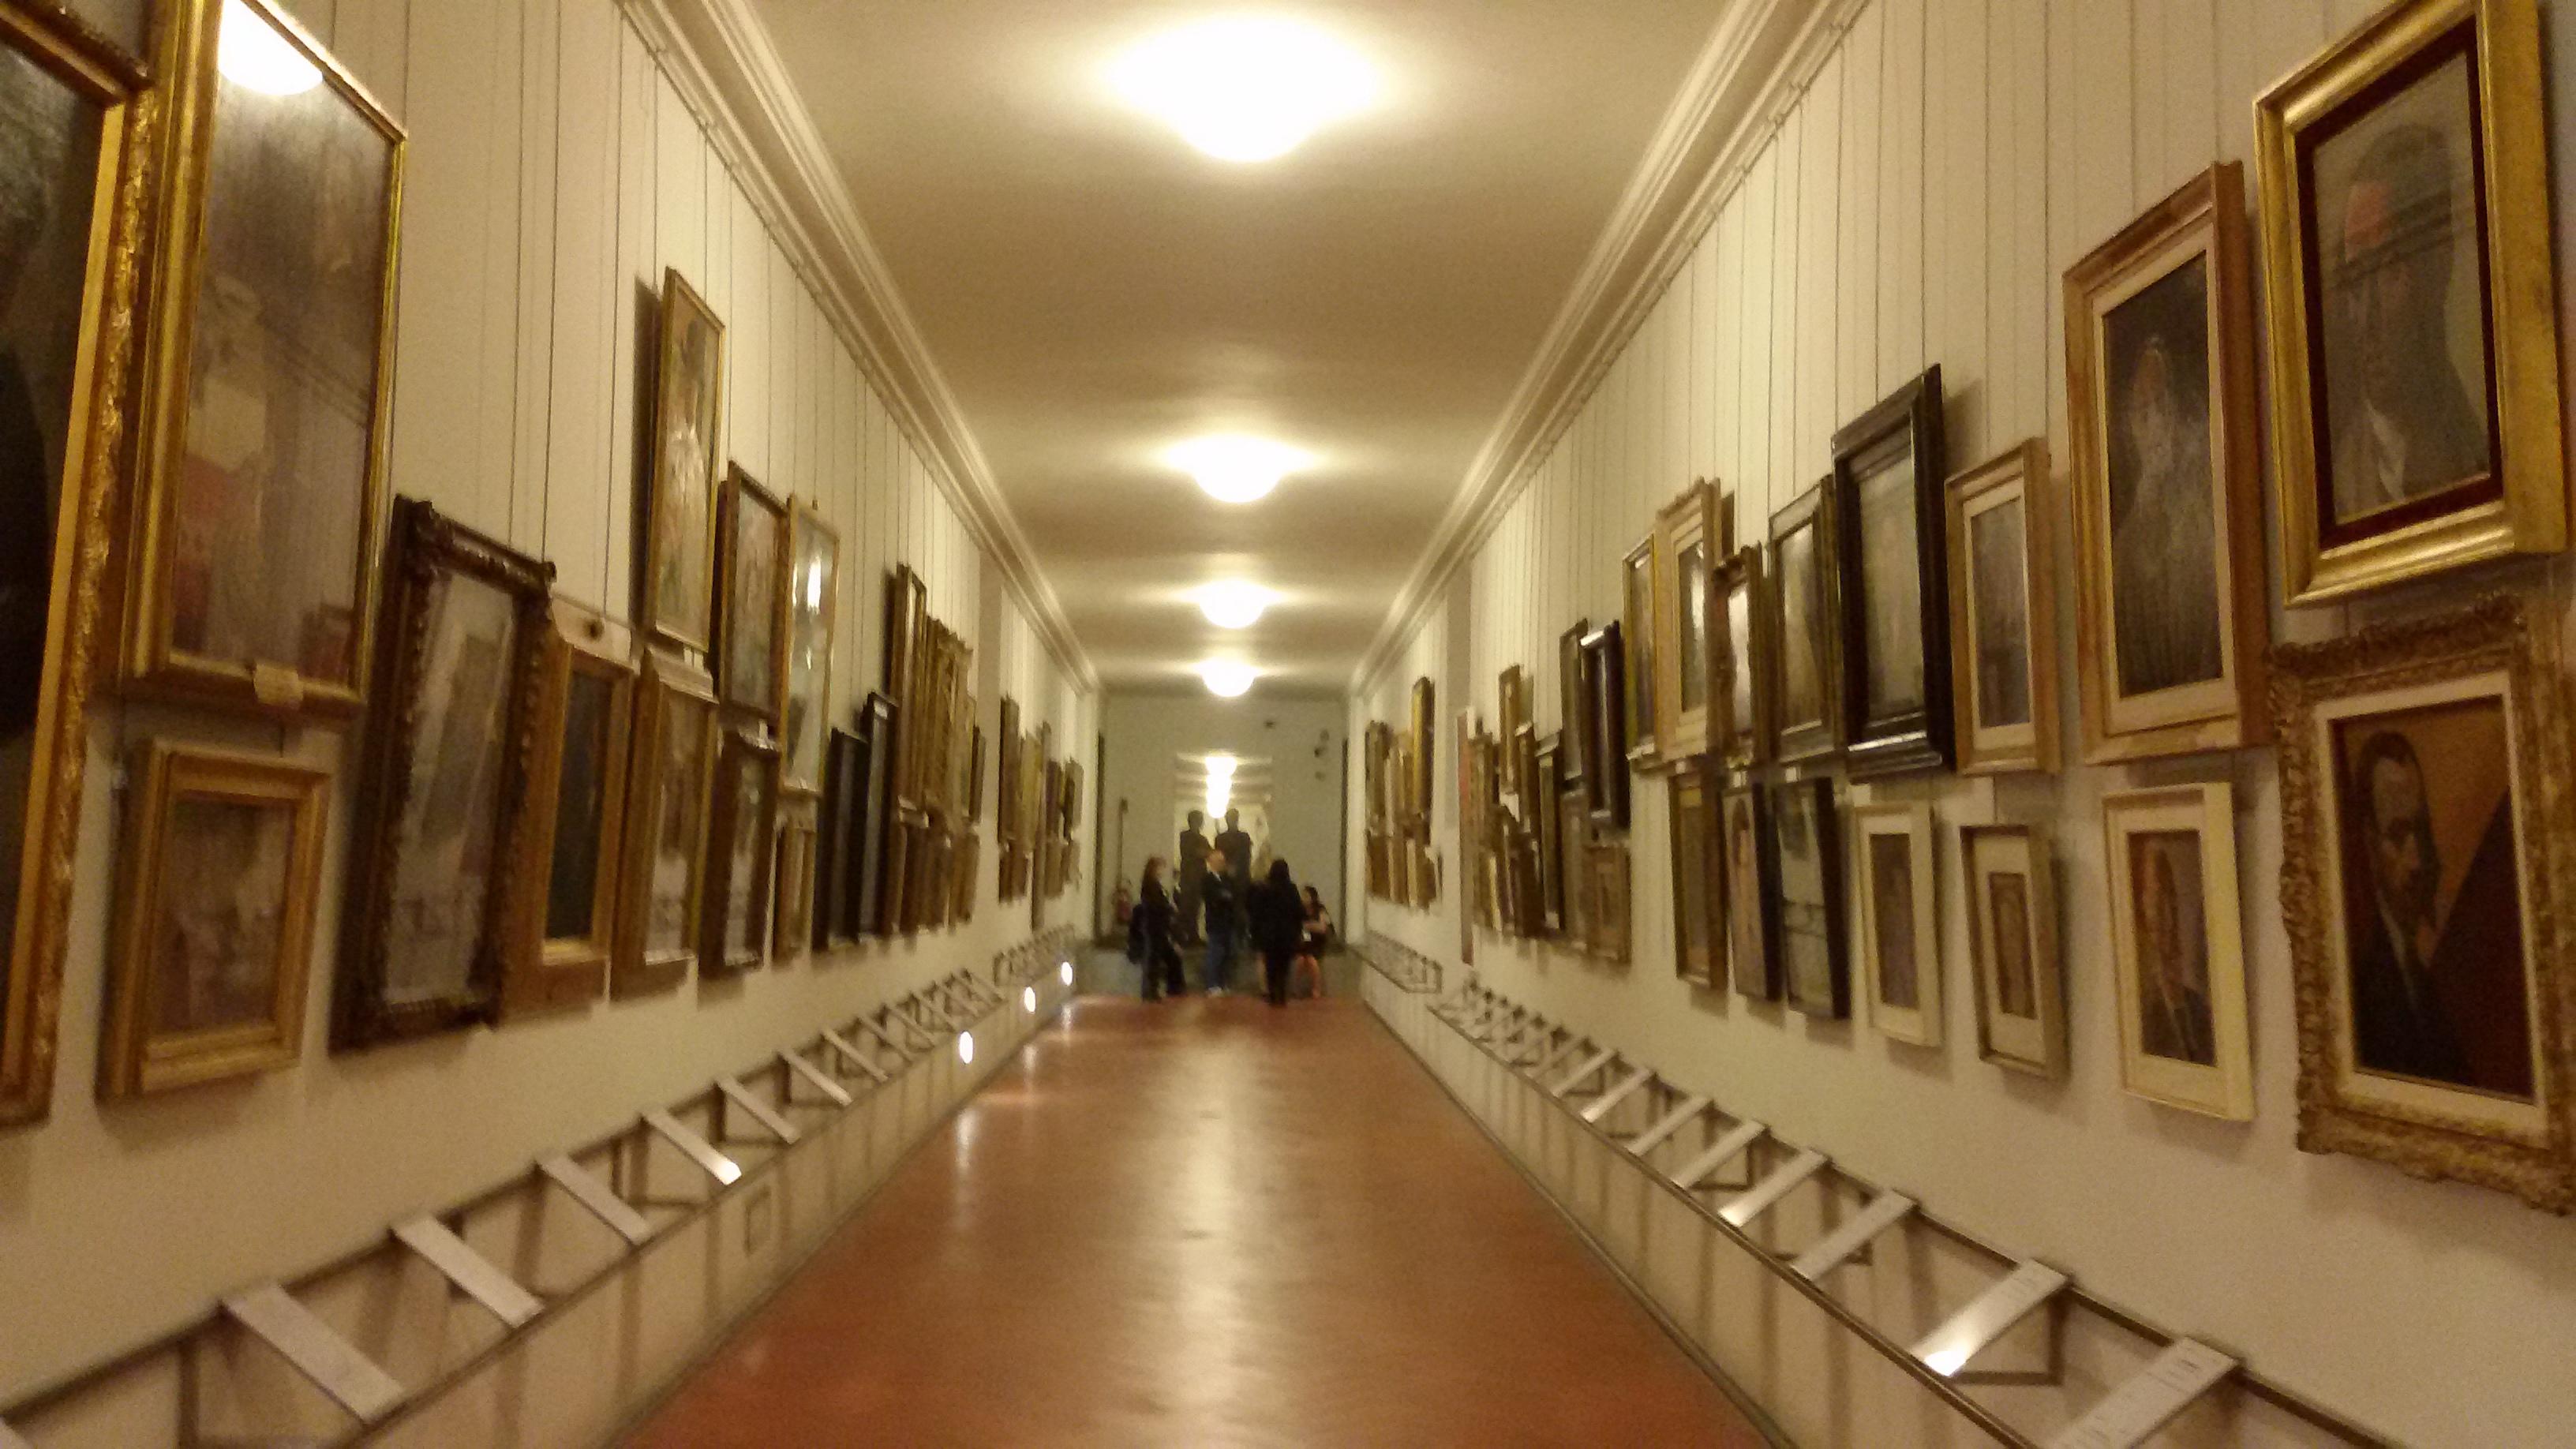 inside_view_of_the_vasari_corridor_corridoio_vasariano_in_florence_italy_4.jpg